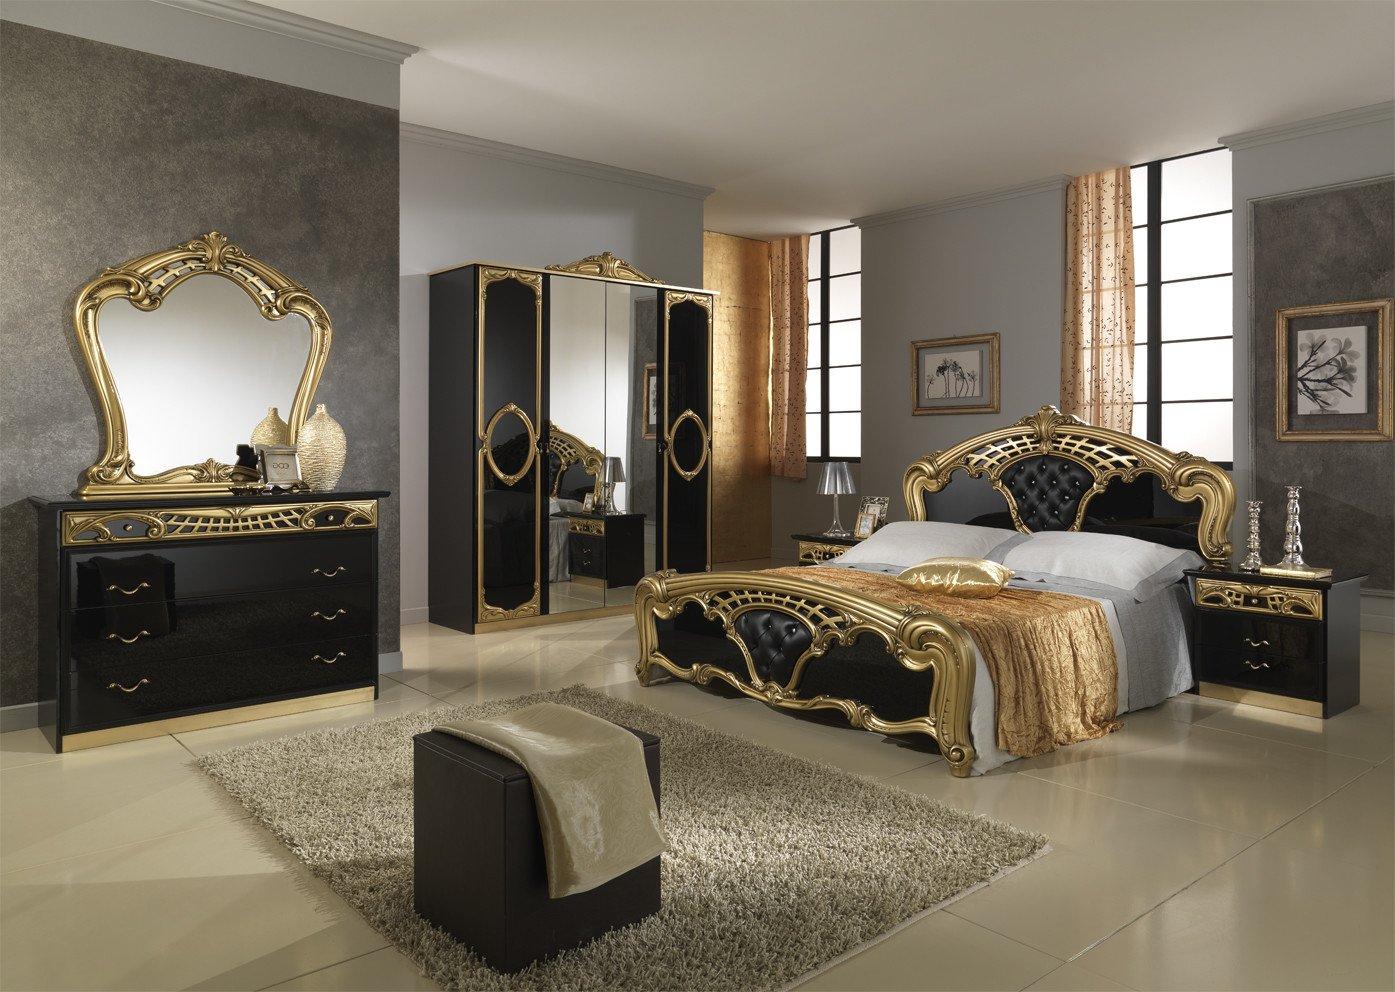 Black and Gold Bedroom Decor New Wonderful Black and Gold Bedroom Ideas